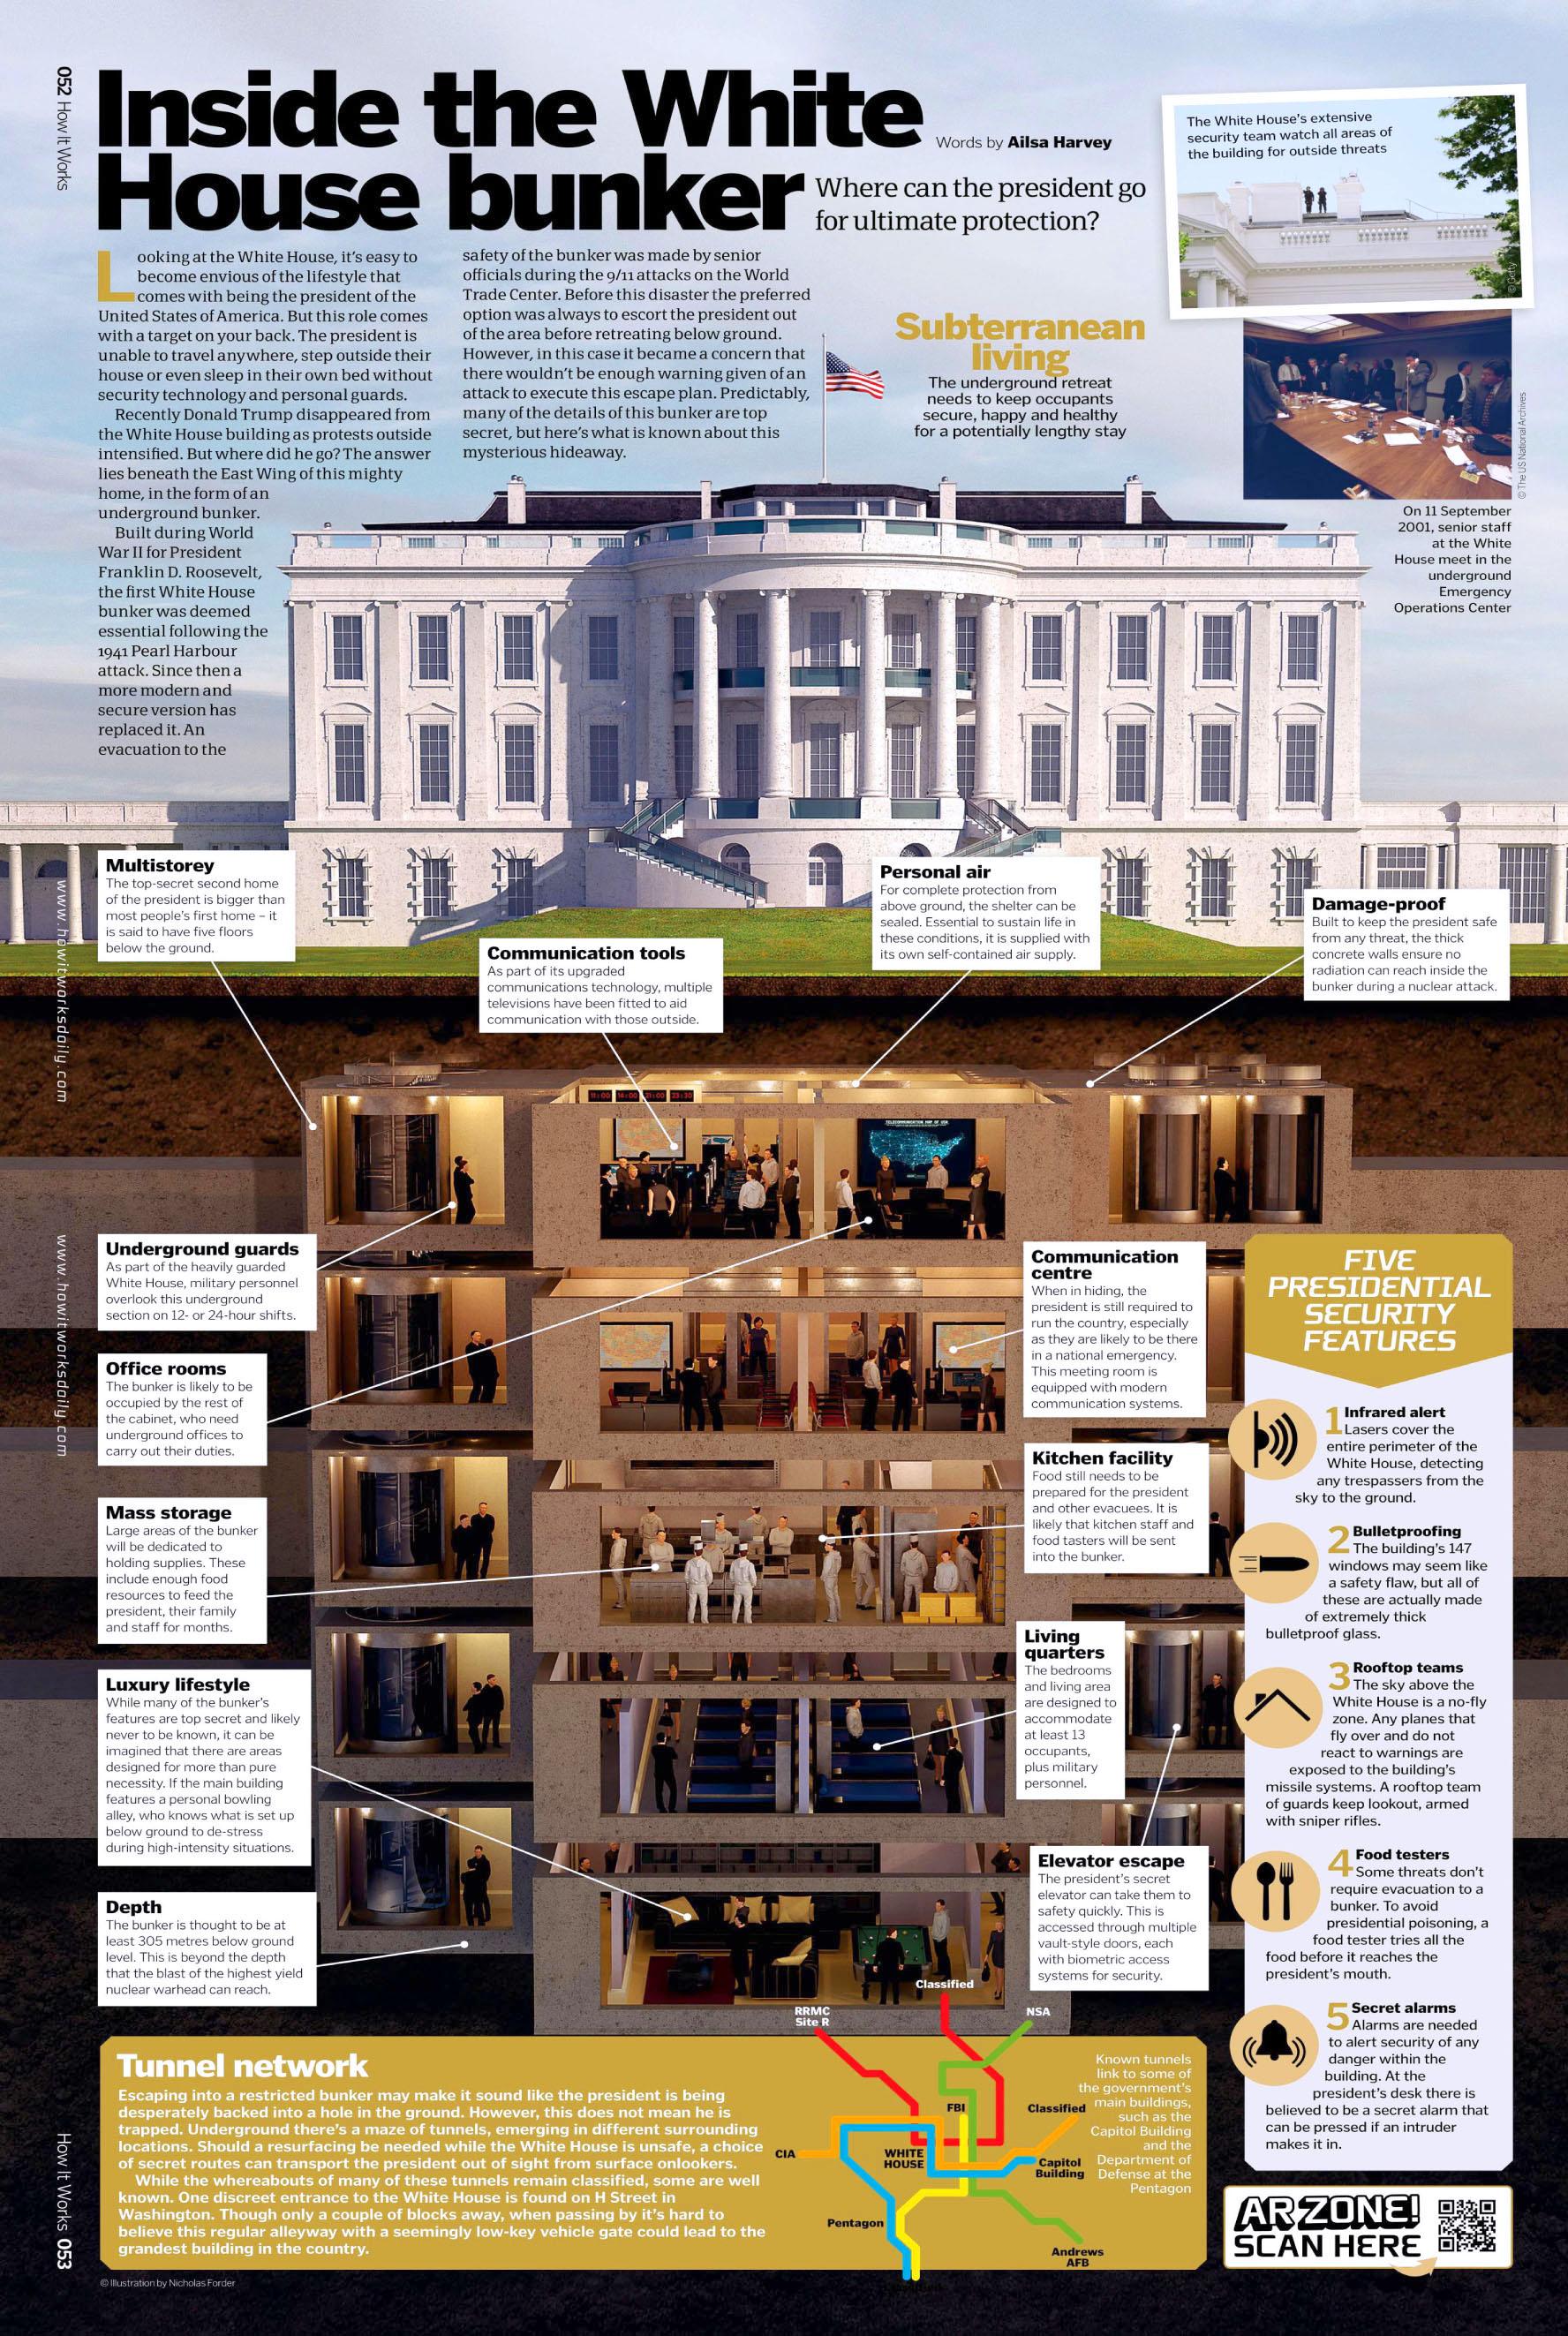 How It Works 141 2020 White House.jpg